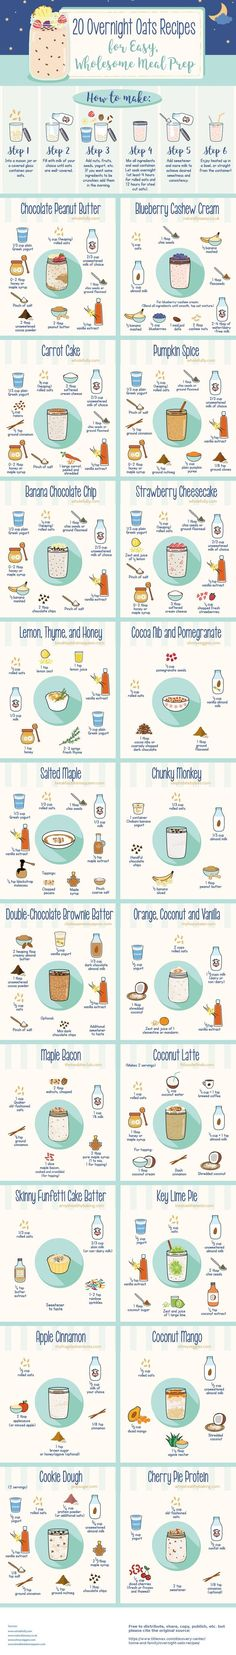 Super-healthy overnight oats options (20 recipes). #breakfast #healthy